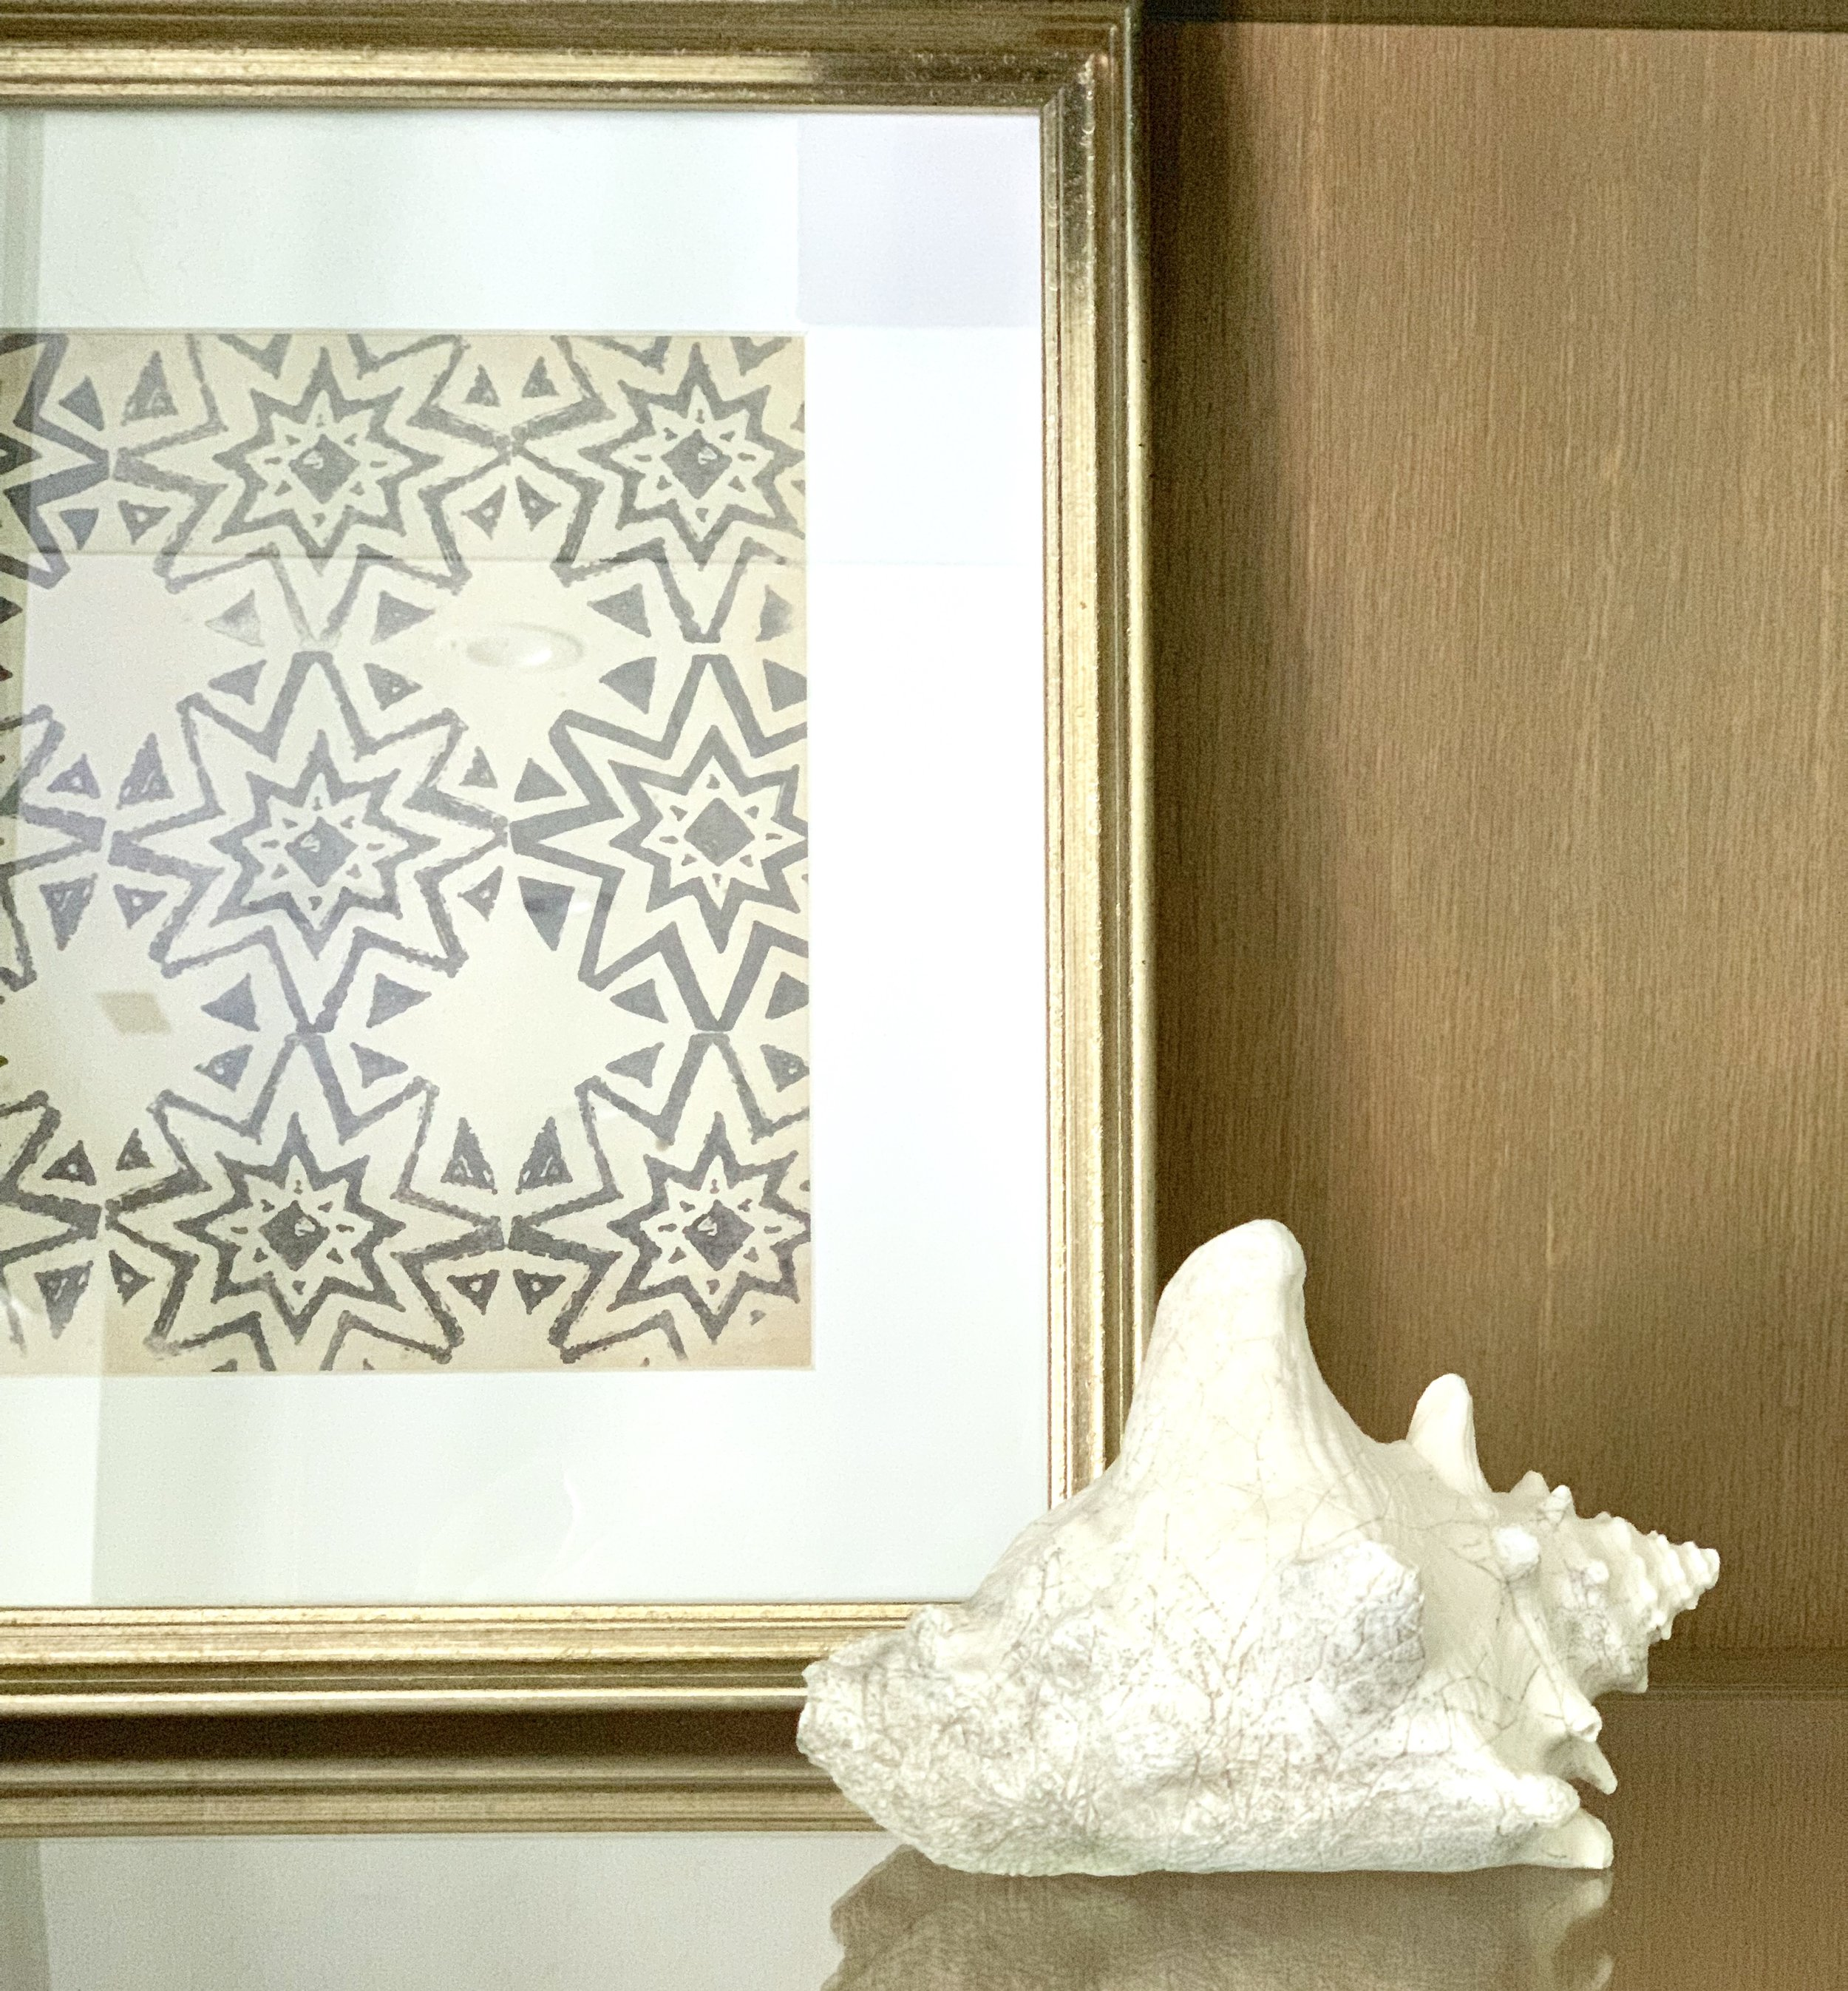 Ballard Designs Petite Vintage Blockprint Art modern farmhouse shelf décor. Farmhouse Redefined.